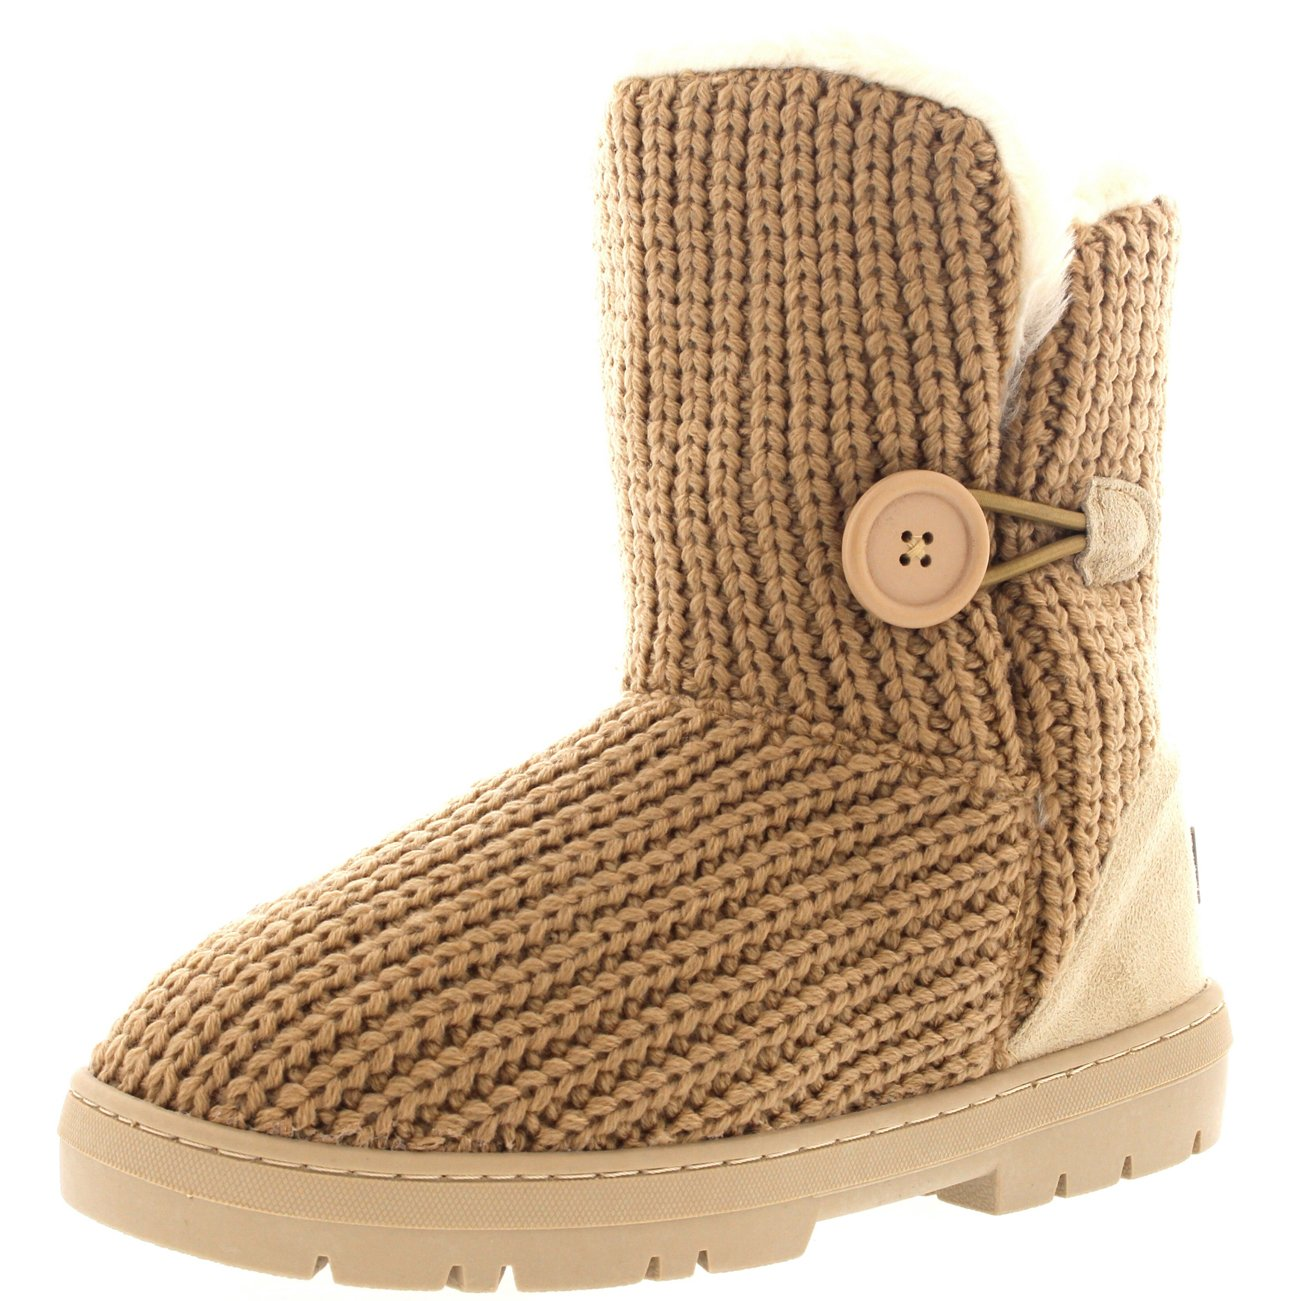 Womens Single Button Fully Fur Lined Waterproof Winter Snow Boots B00YUUGX2U 8 B(M) US|Beige Knitted